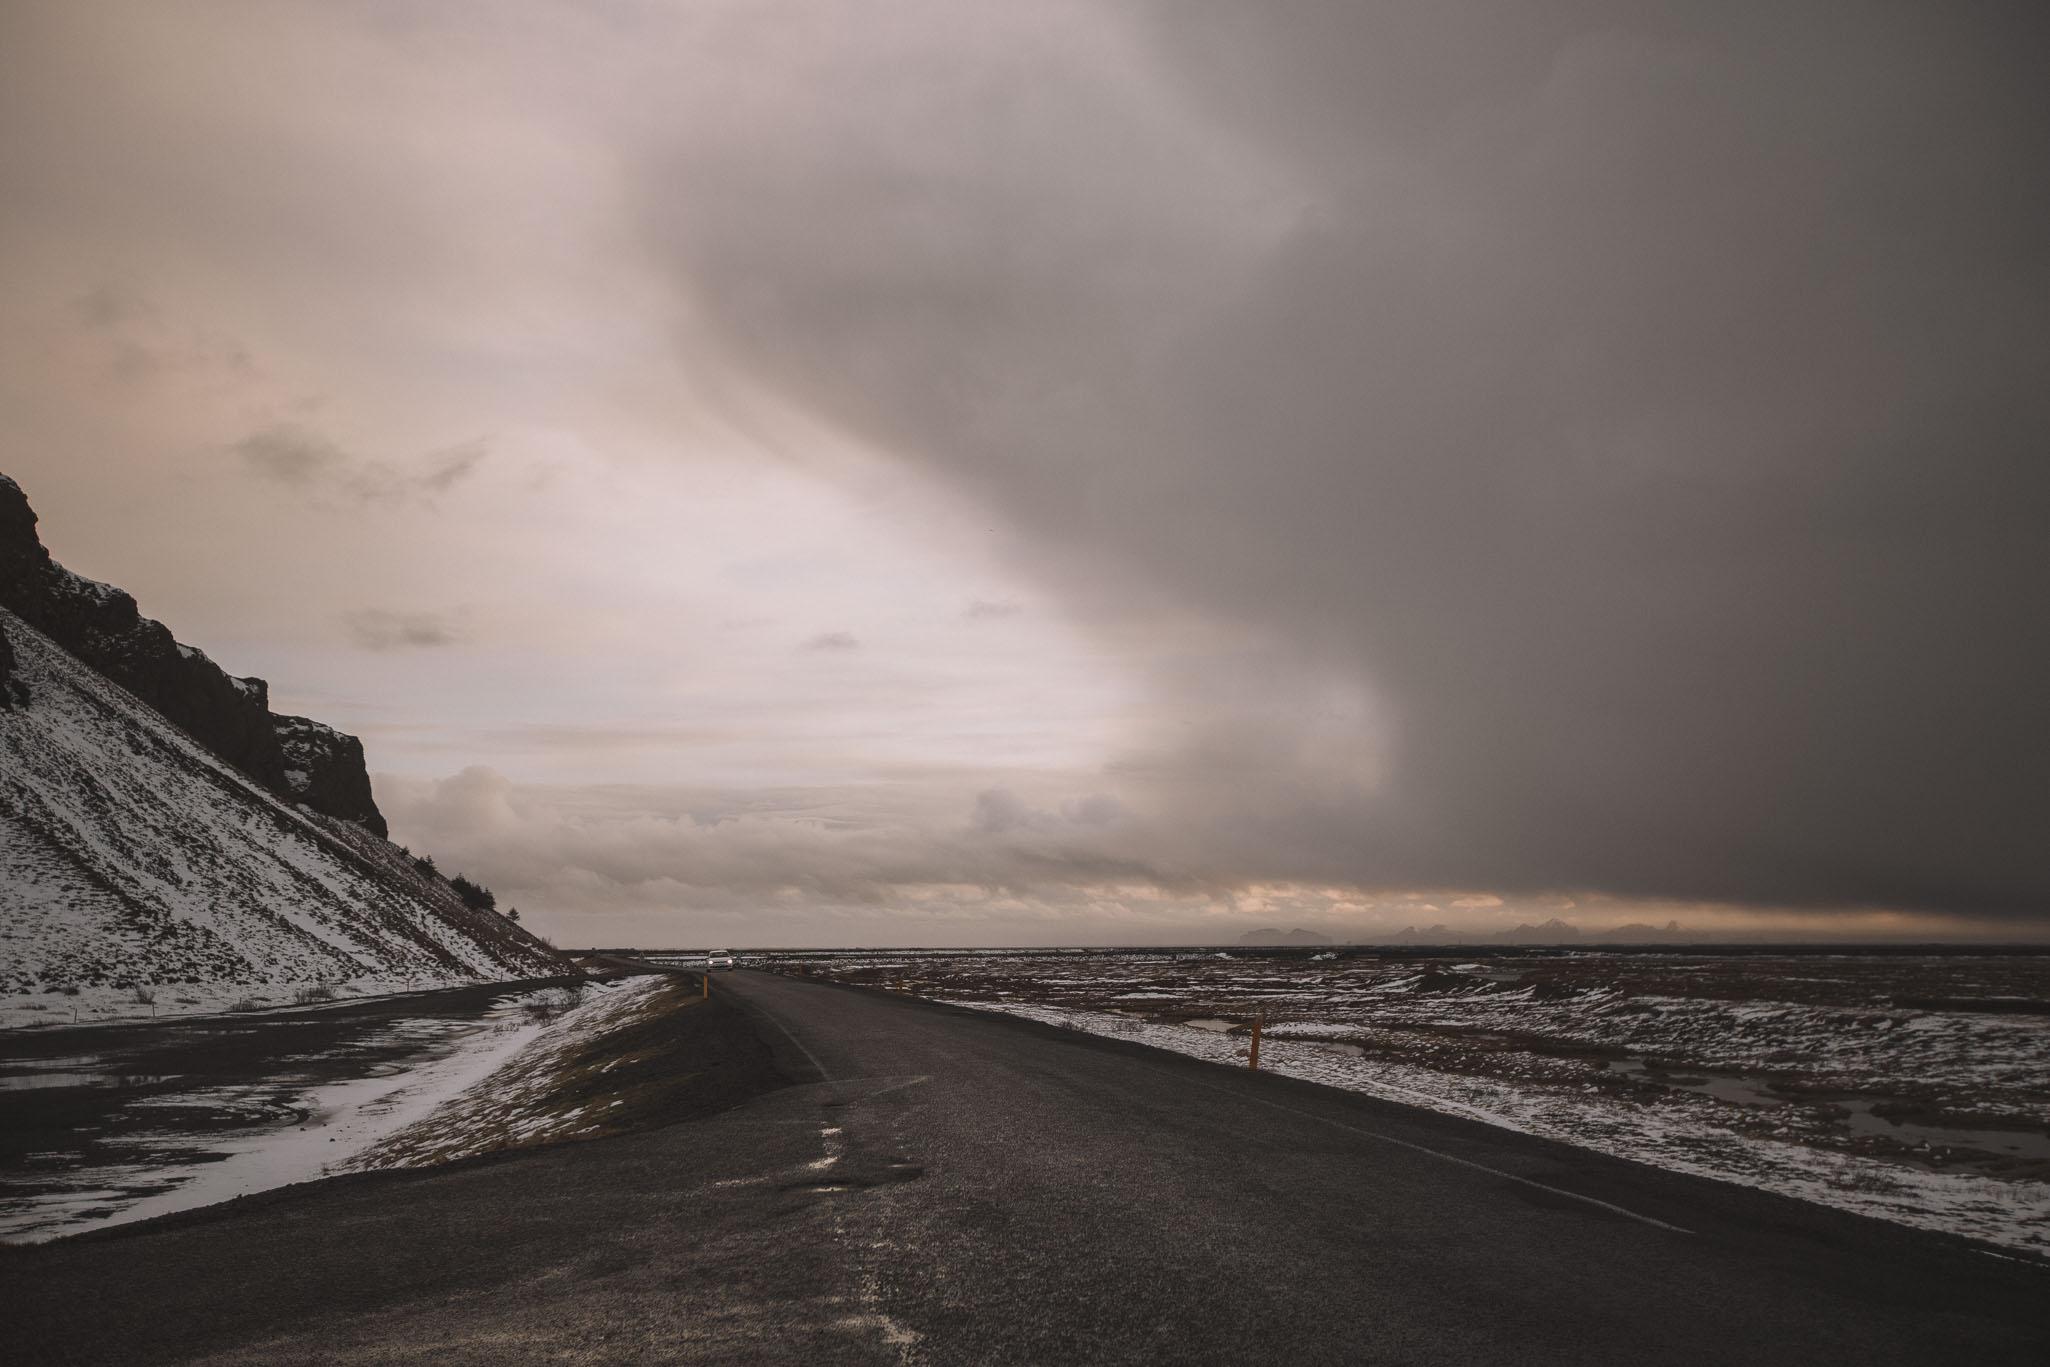 Road-trip-Islande-Iceland-Voyage-Travel-Portrait-Jérémy-Boyer-Cascade-waterfall-foss-Seljalandsfoss-1.jpg